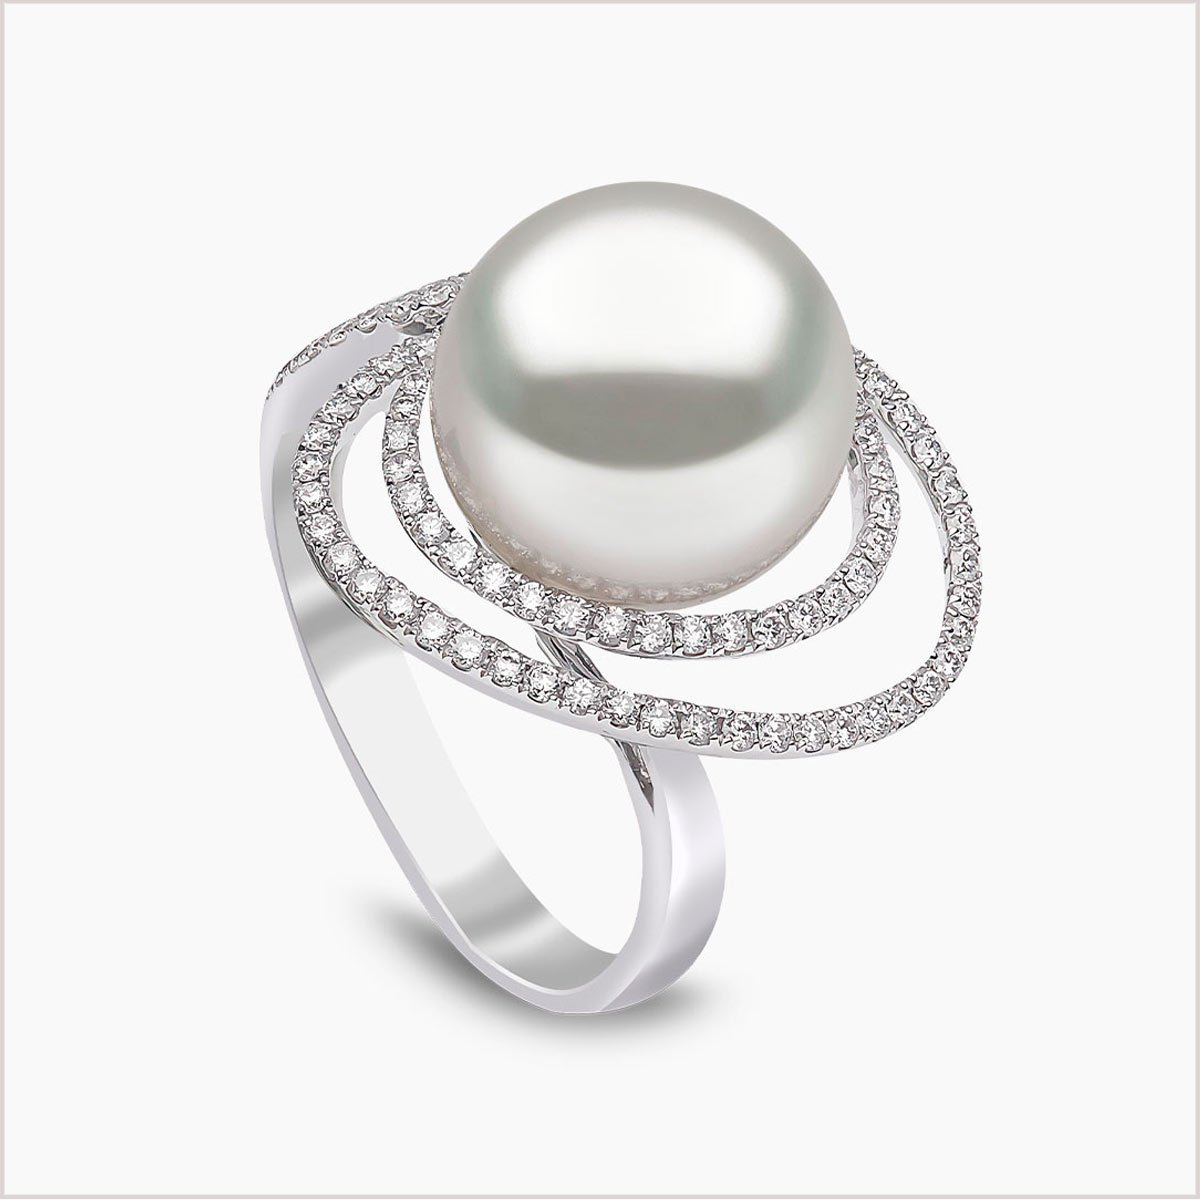 Yoko London South Sea Pearl and Diamond Ring